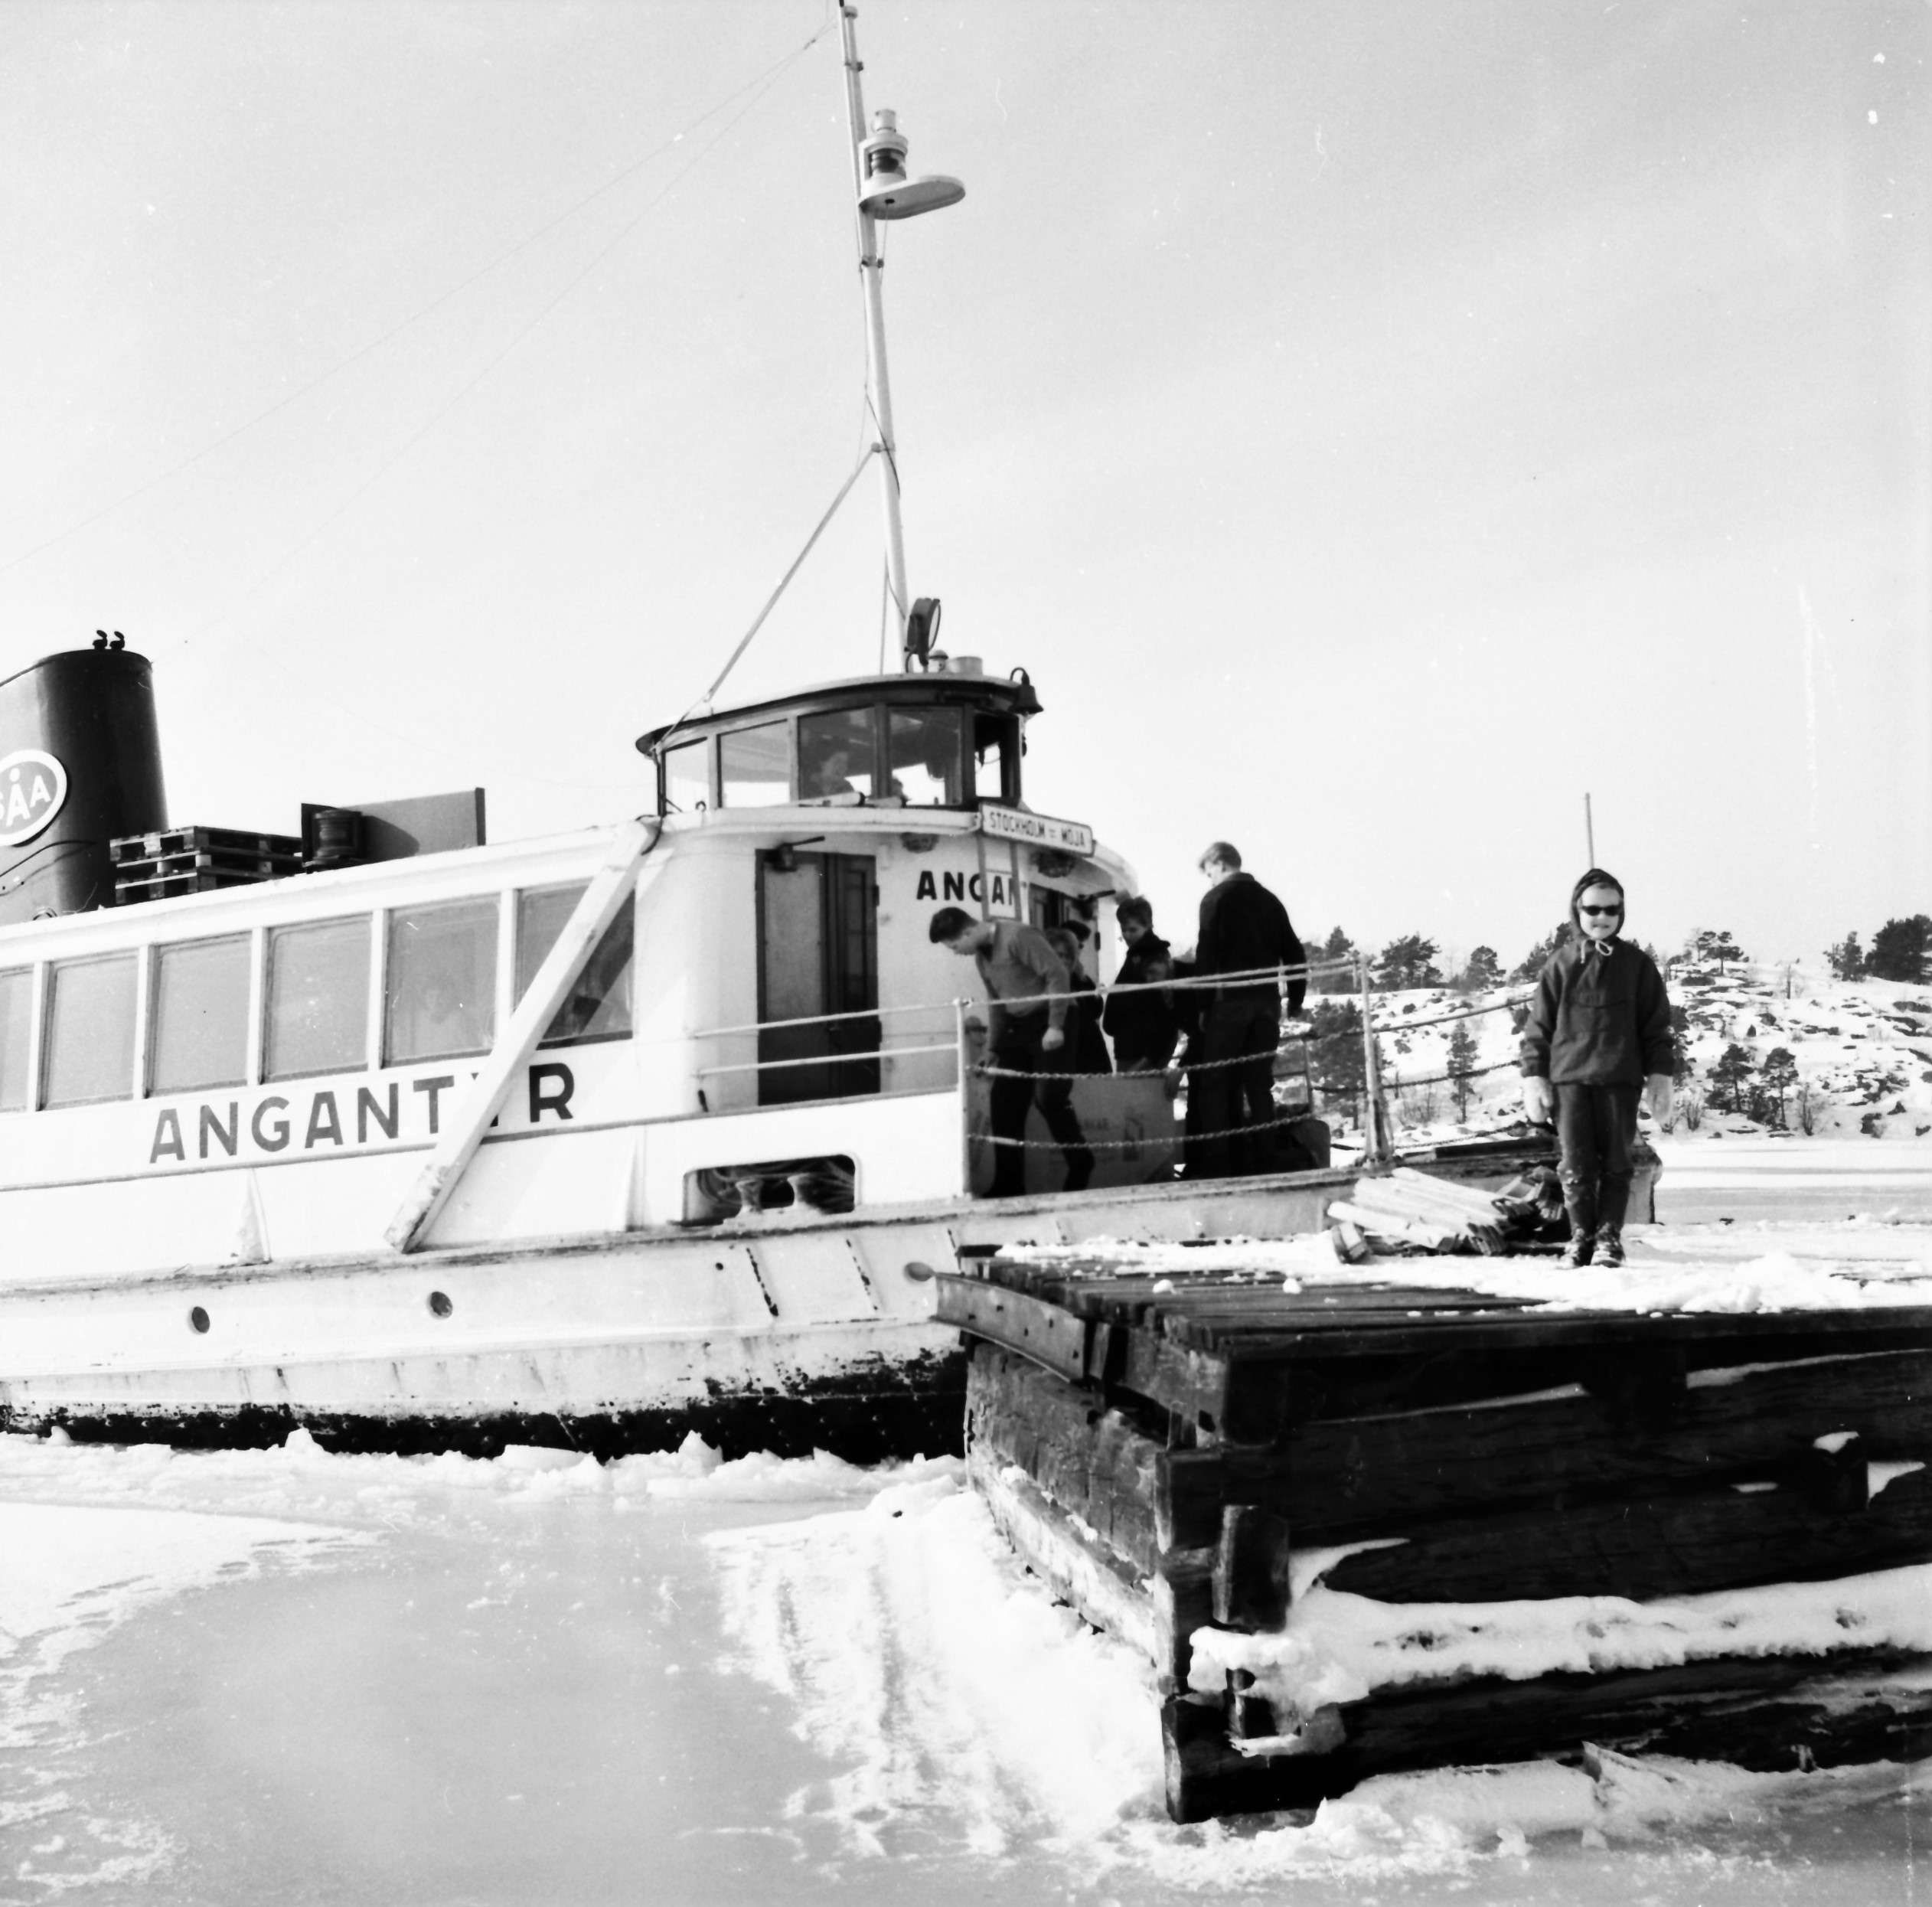 Angantyr-1964 (foto: S-O Fredriksson)